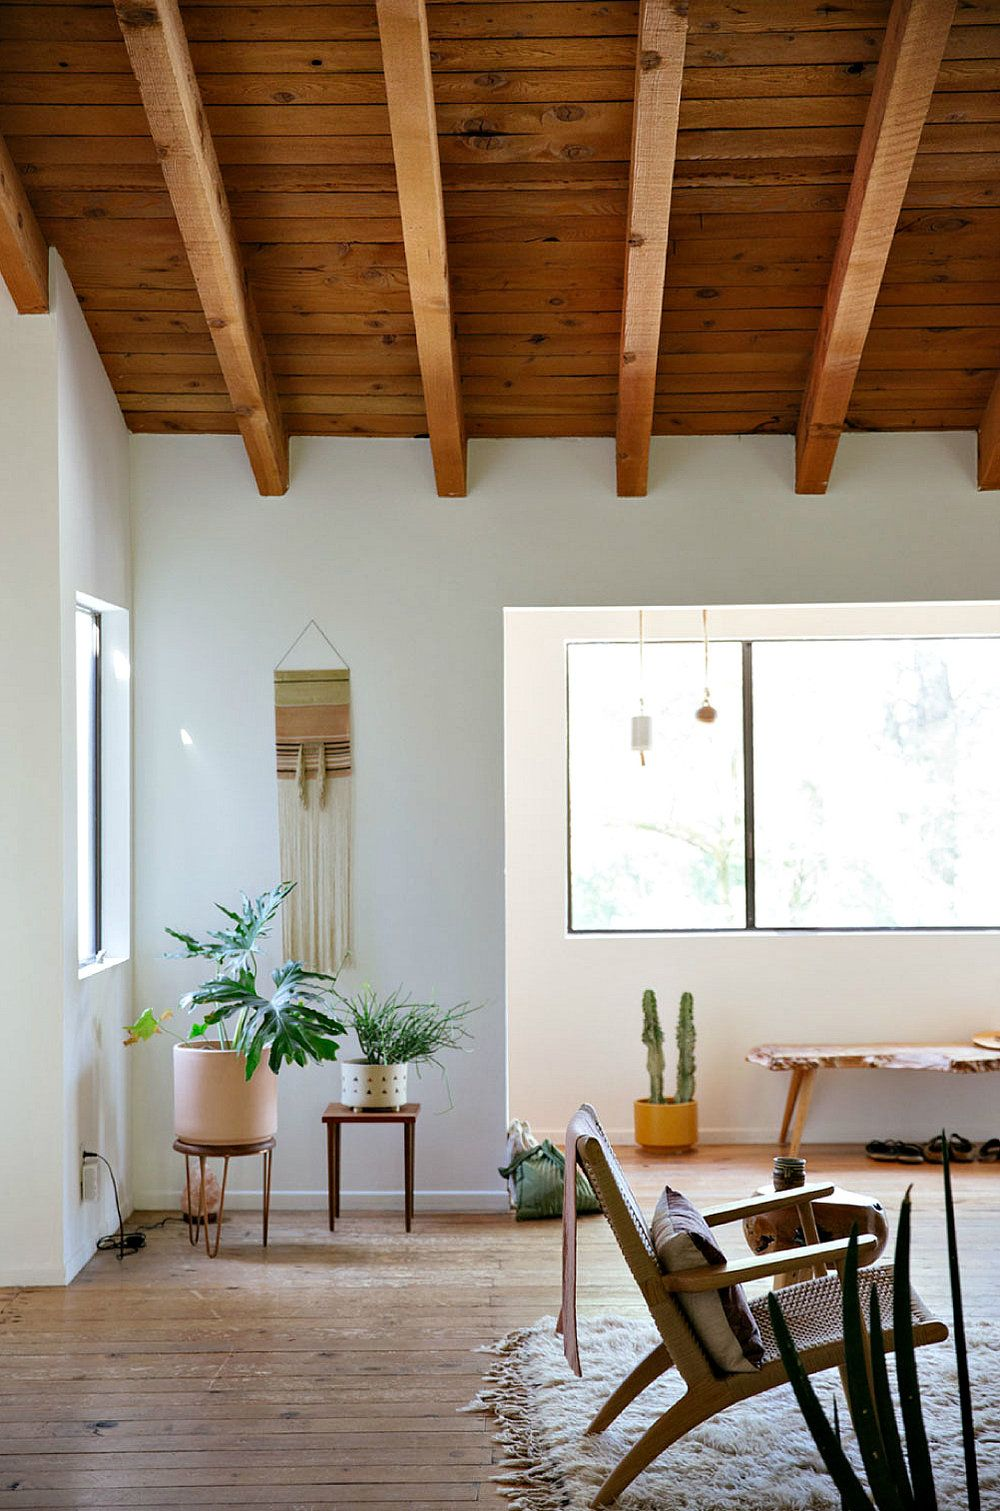 Malia Bianchi-Mau's Artistic Topanga Home + Relaxed